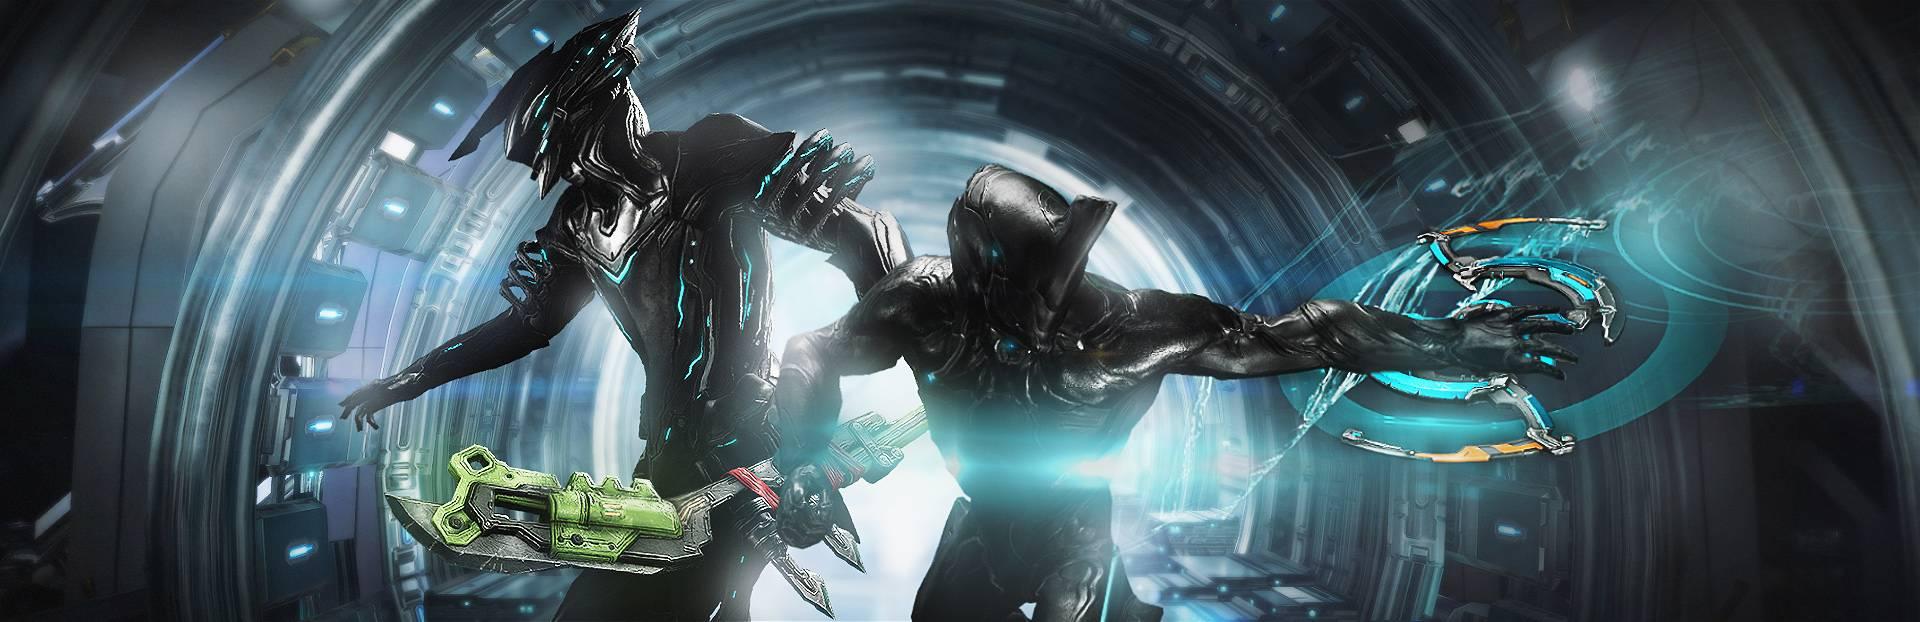 XB1 Chimera: Update 23 10 6 (Prime Vault + Hotfixes!) - Xbox